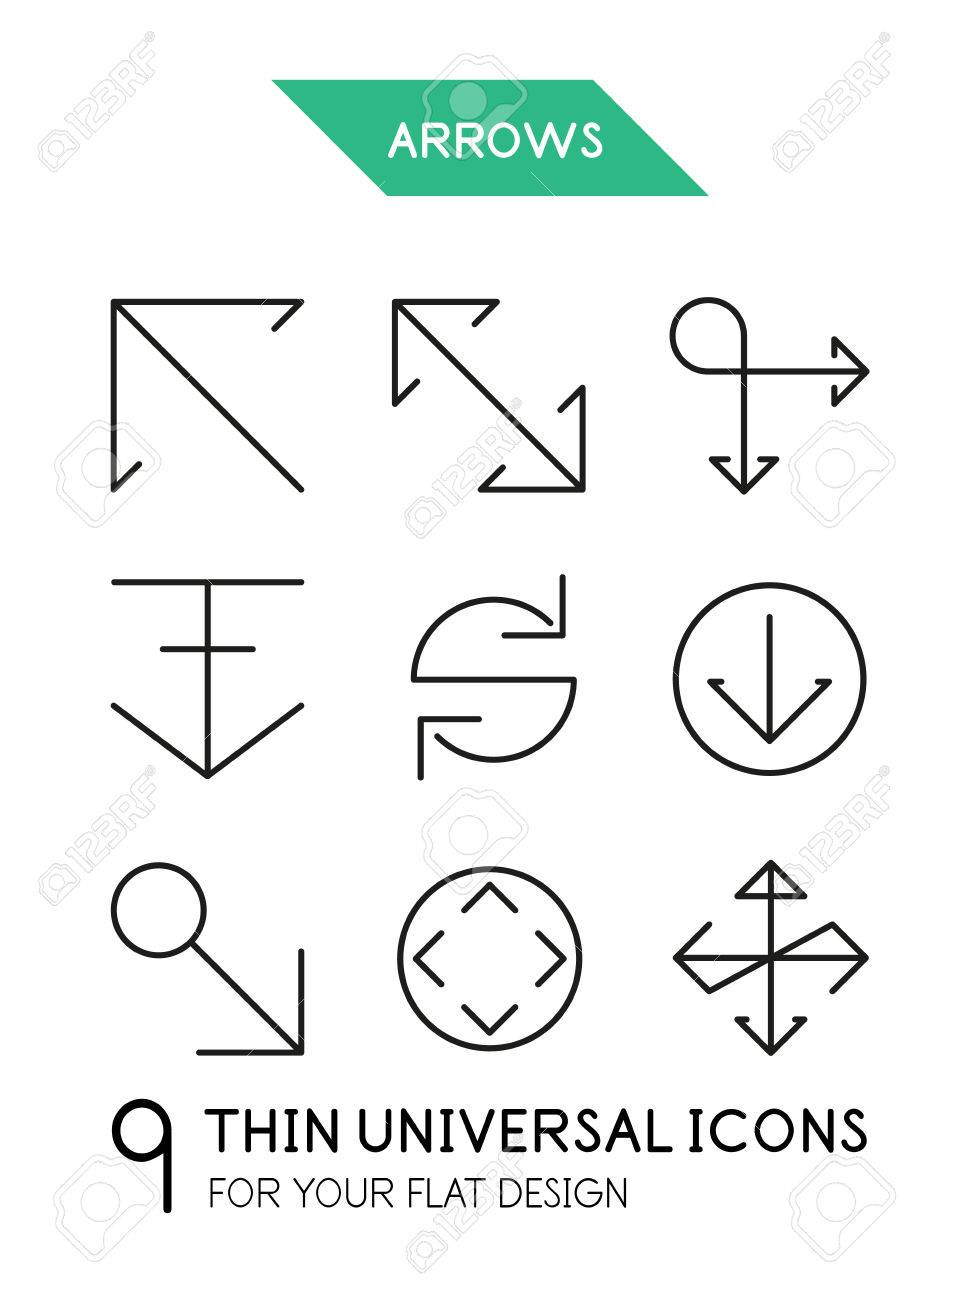 Arrow Thin Line Icon Set 9 Computer Symbols For Your Flat Deisgn